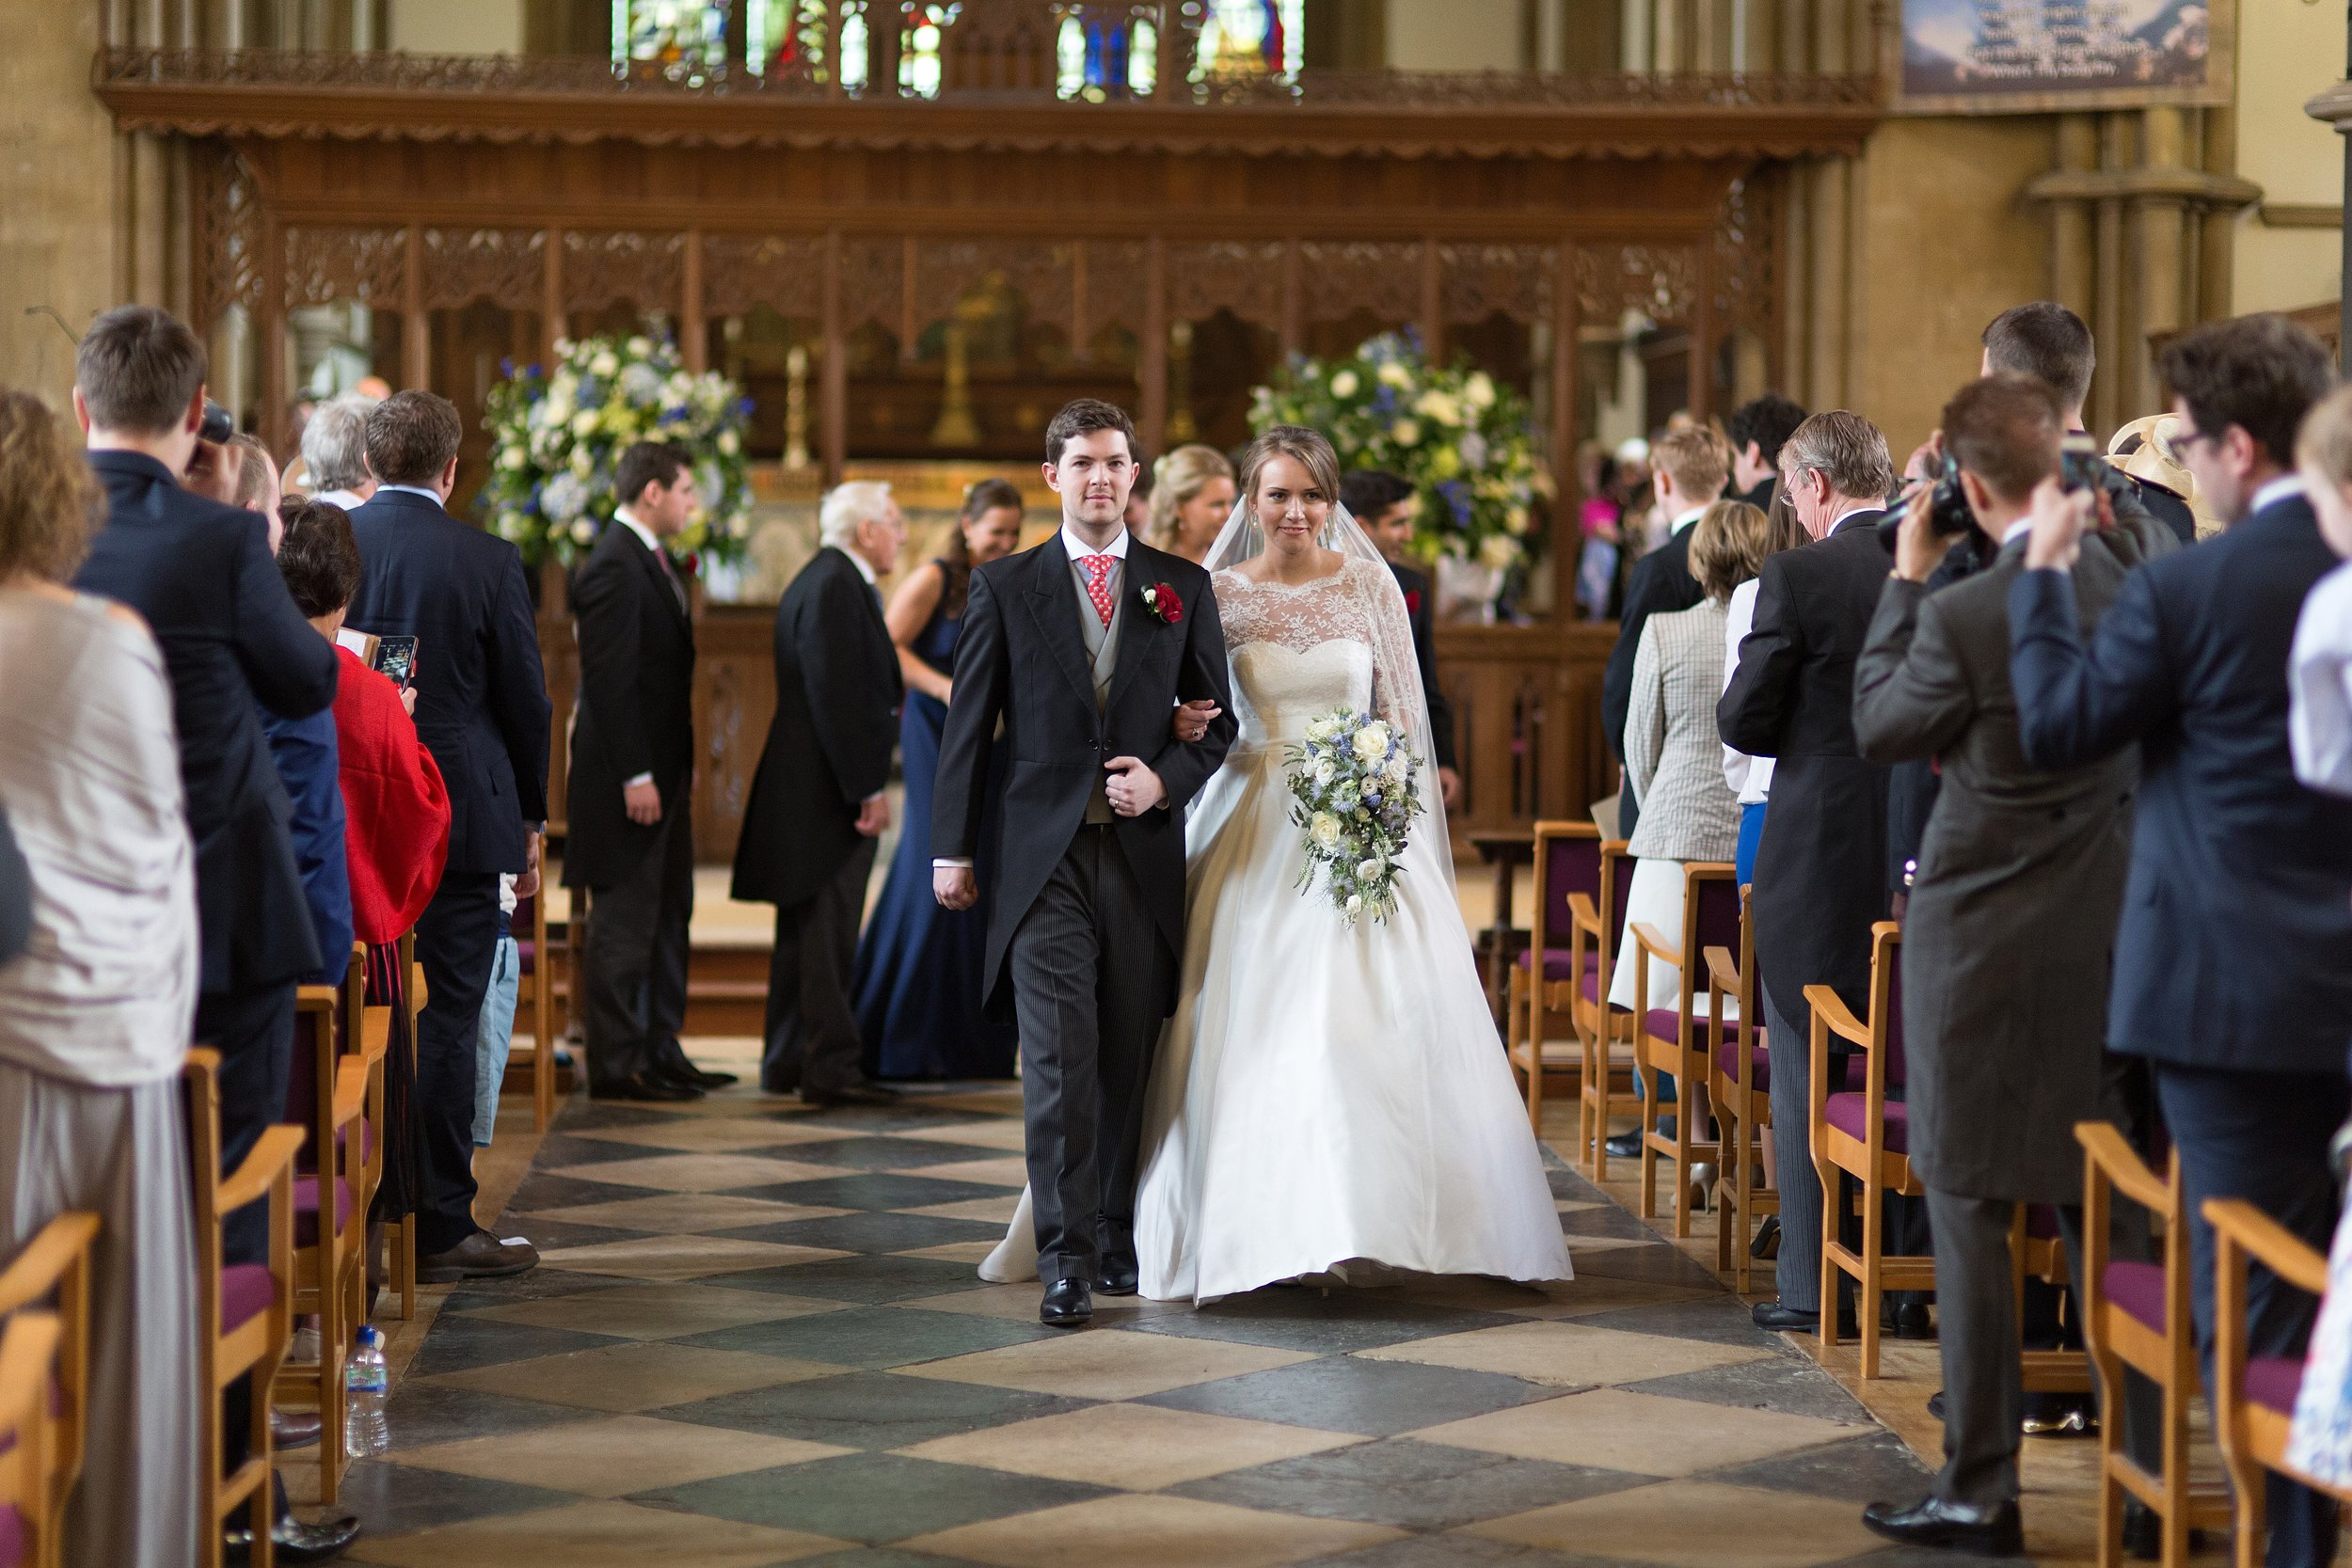 MIRIAM_FAITH_WEDDING_FLOWERS_CEREMONY_CASCADE_BRIDE_BOUQUET.jpg